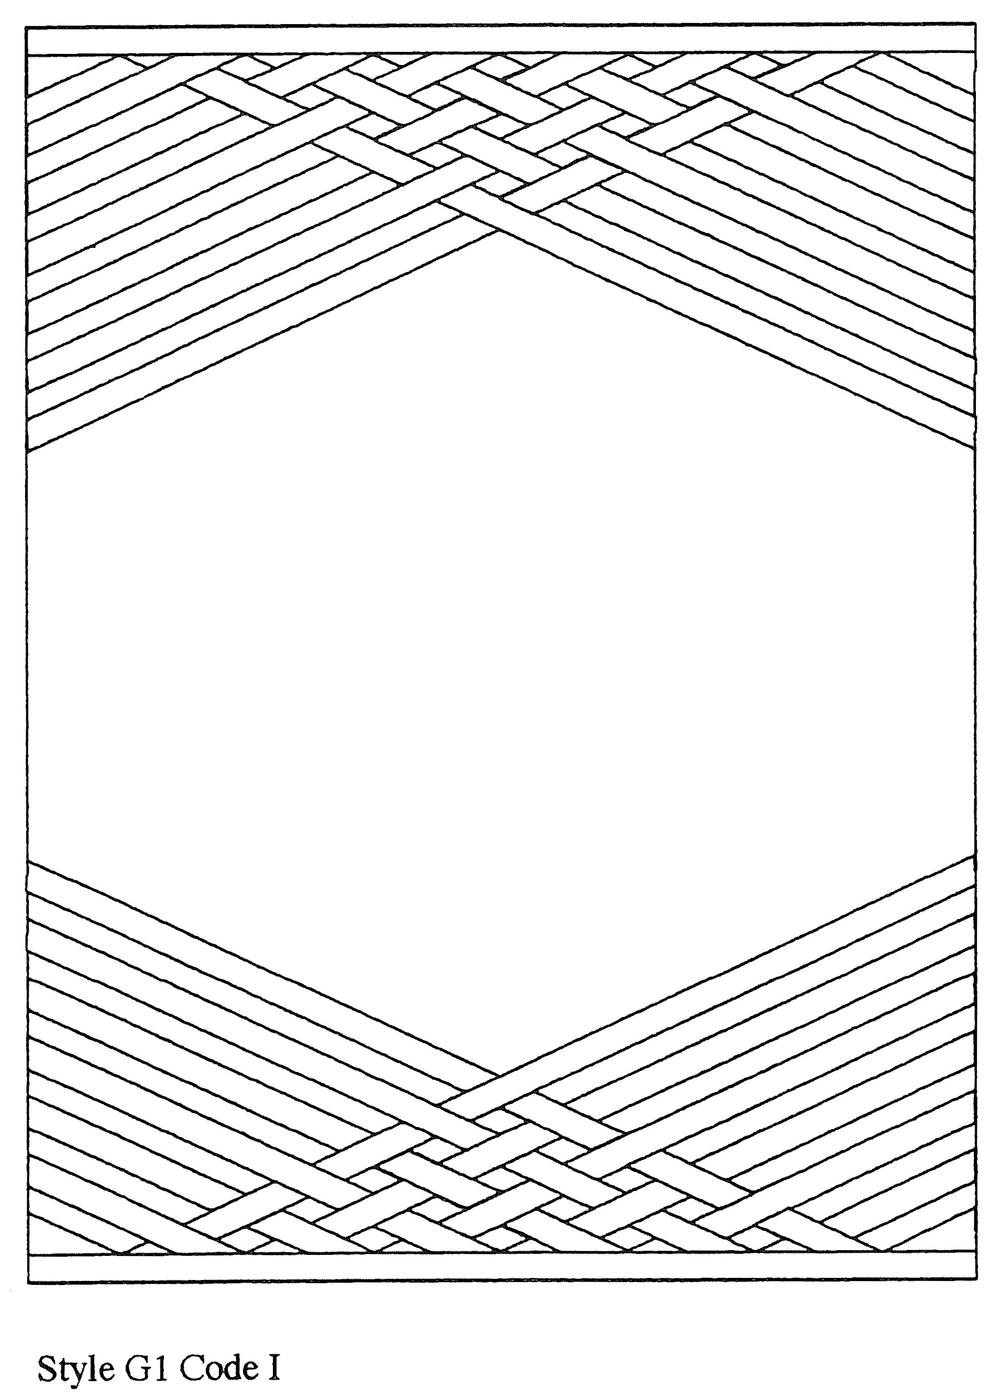 Page 15 copy 2.jpg